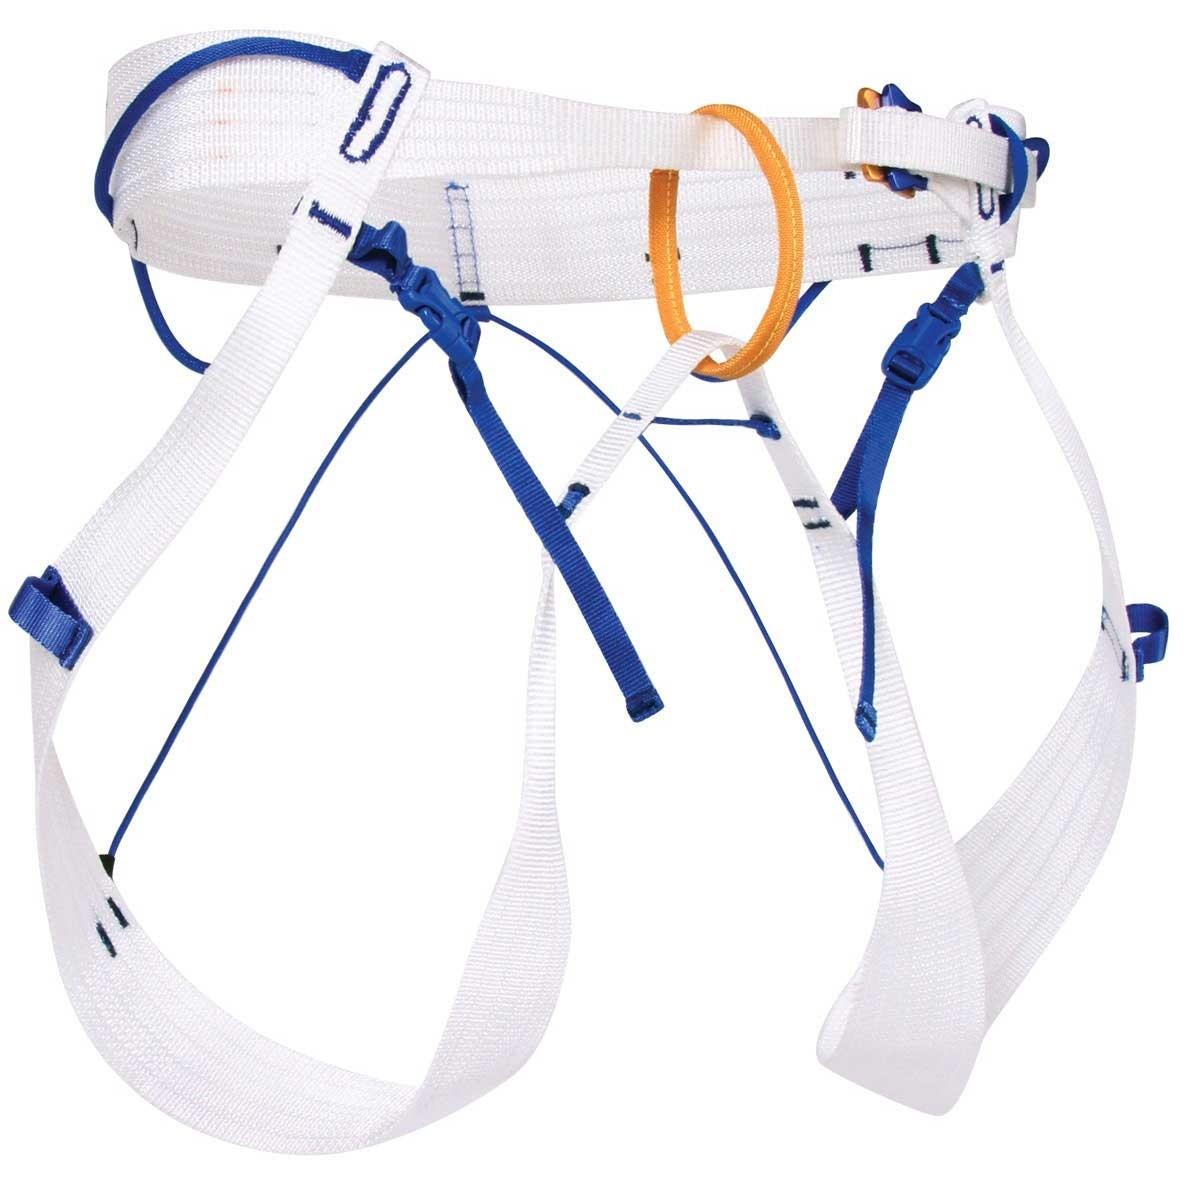 Blue Ice Choucas Climbing Harness - White